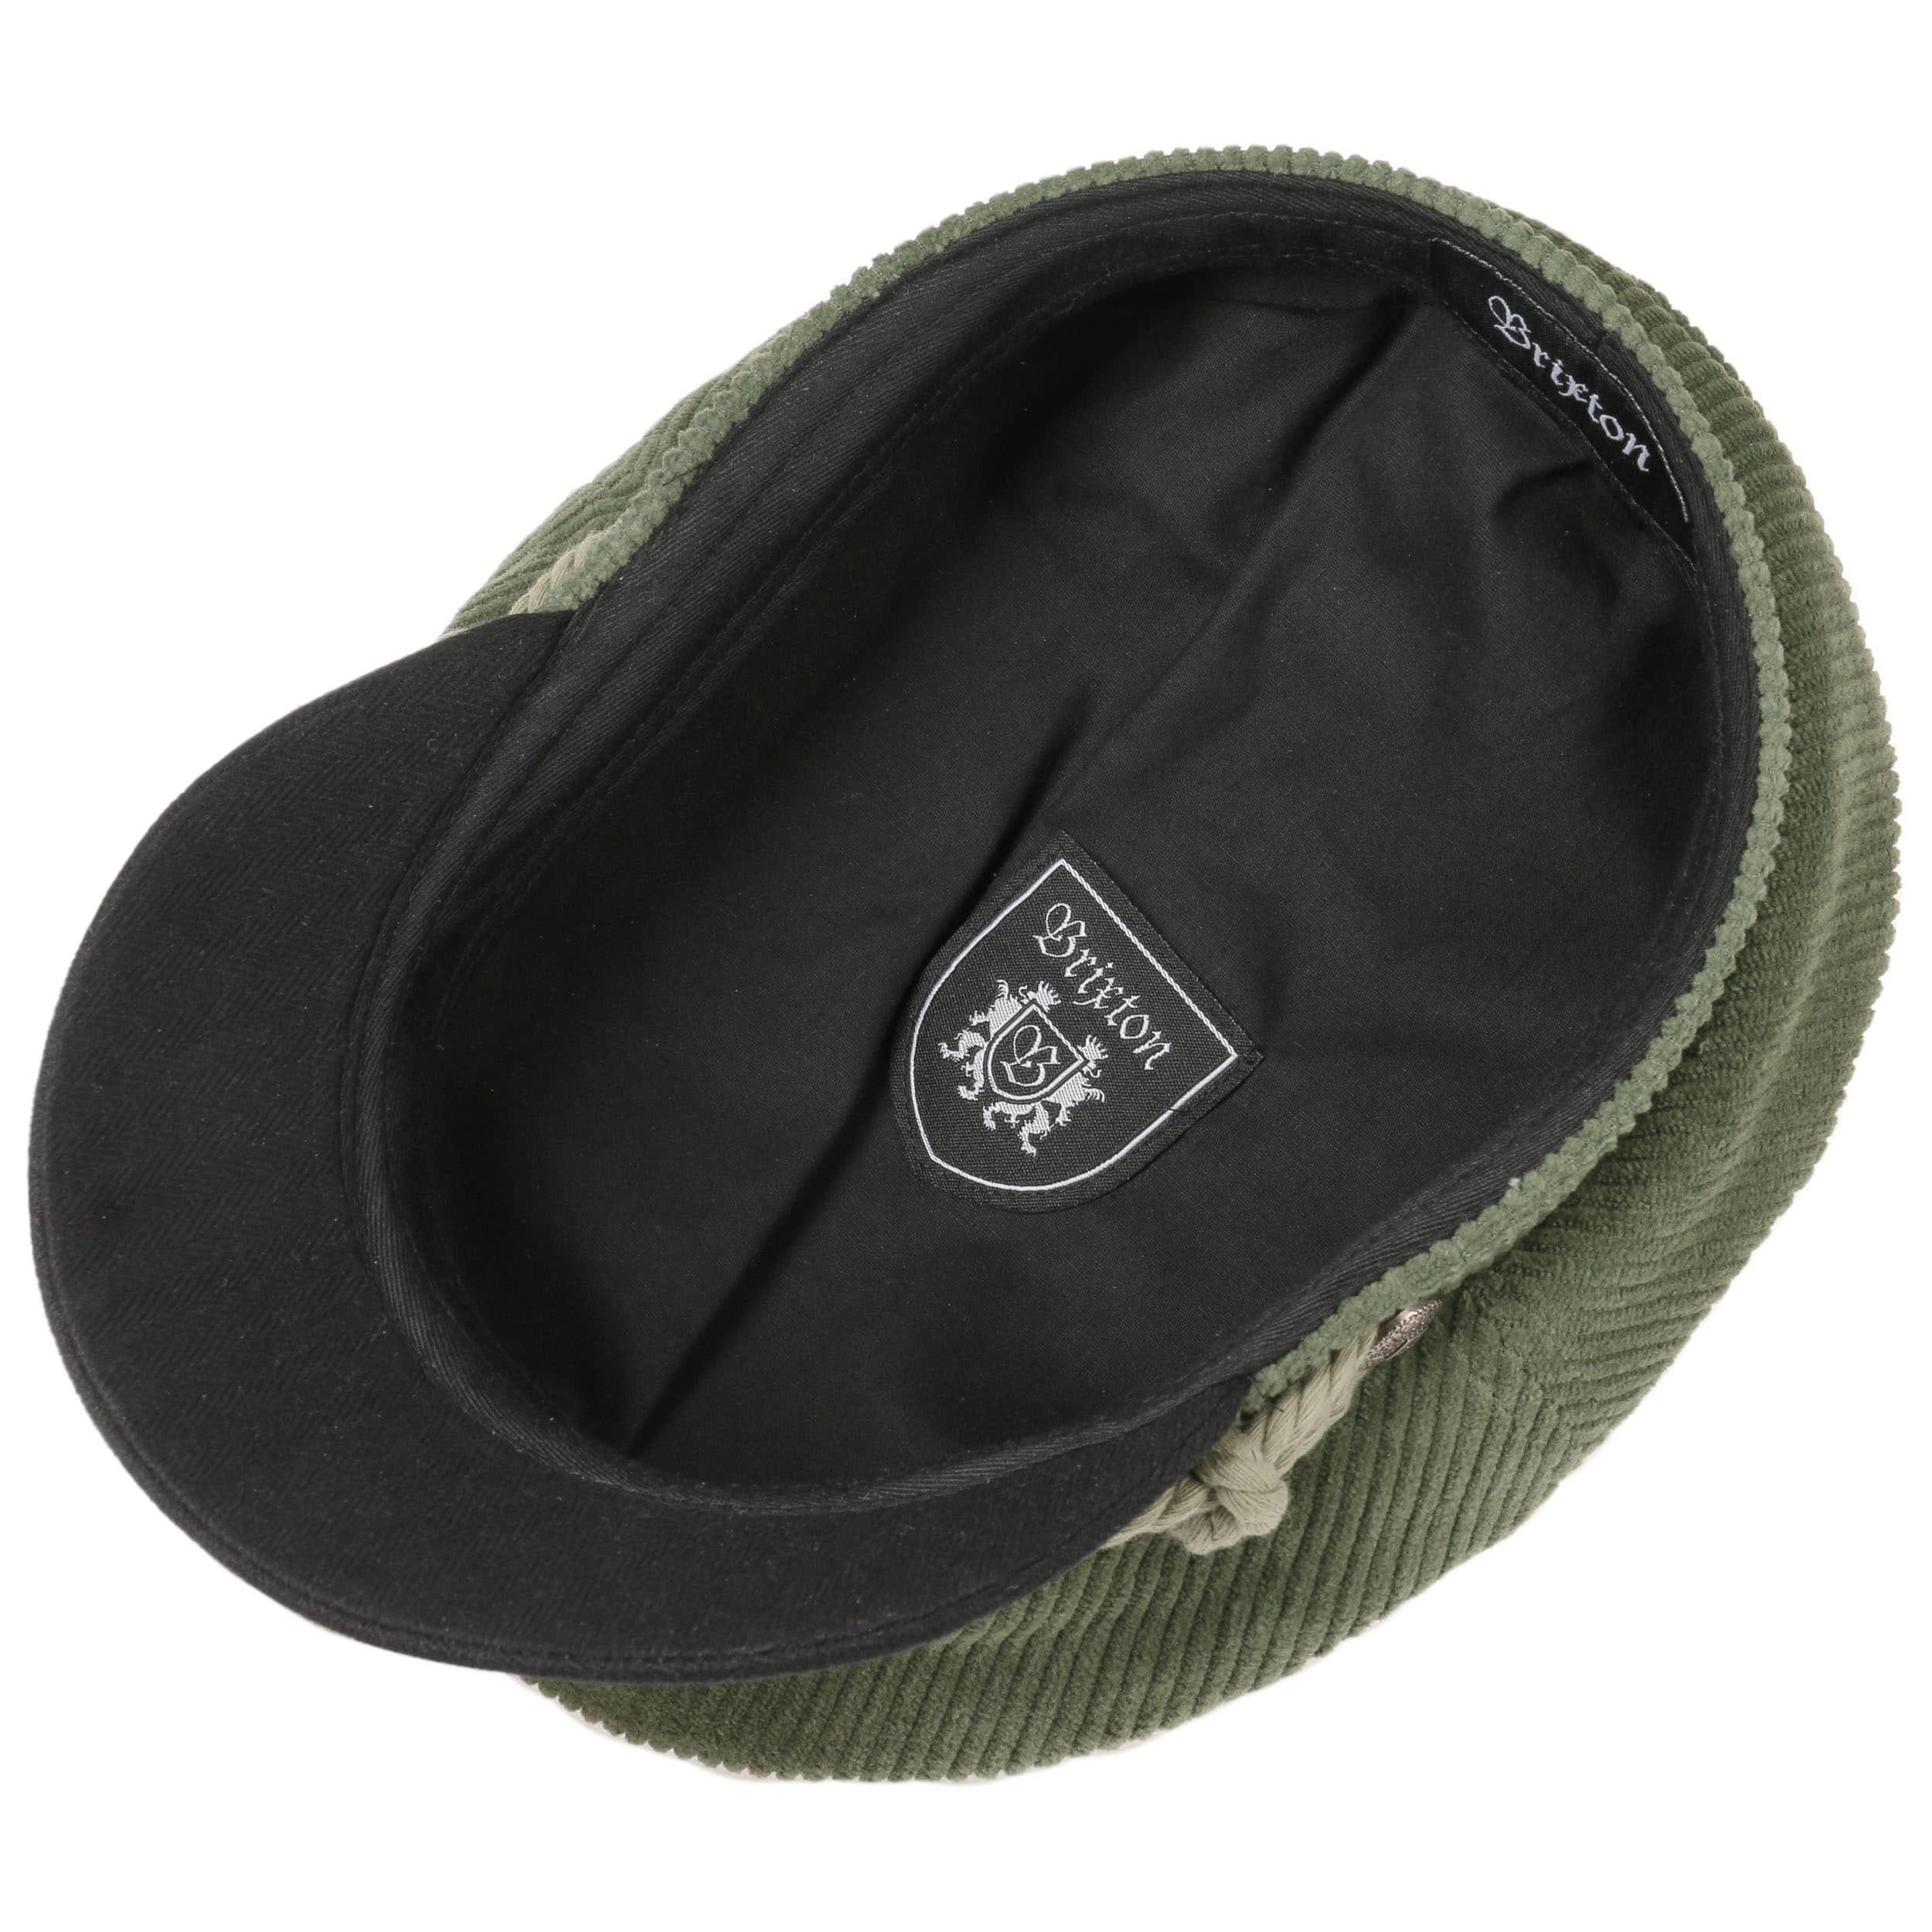 ... Fiddler Green Fisherman´s Cap by Brixton - green 2 ... 91e9bcff1be